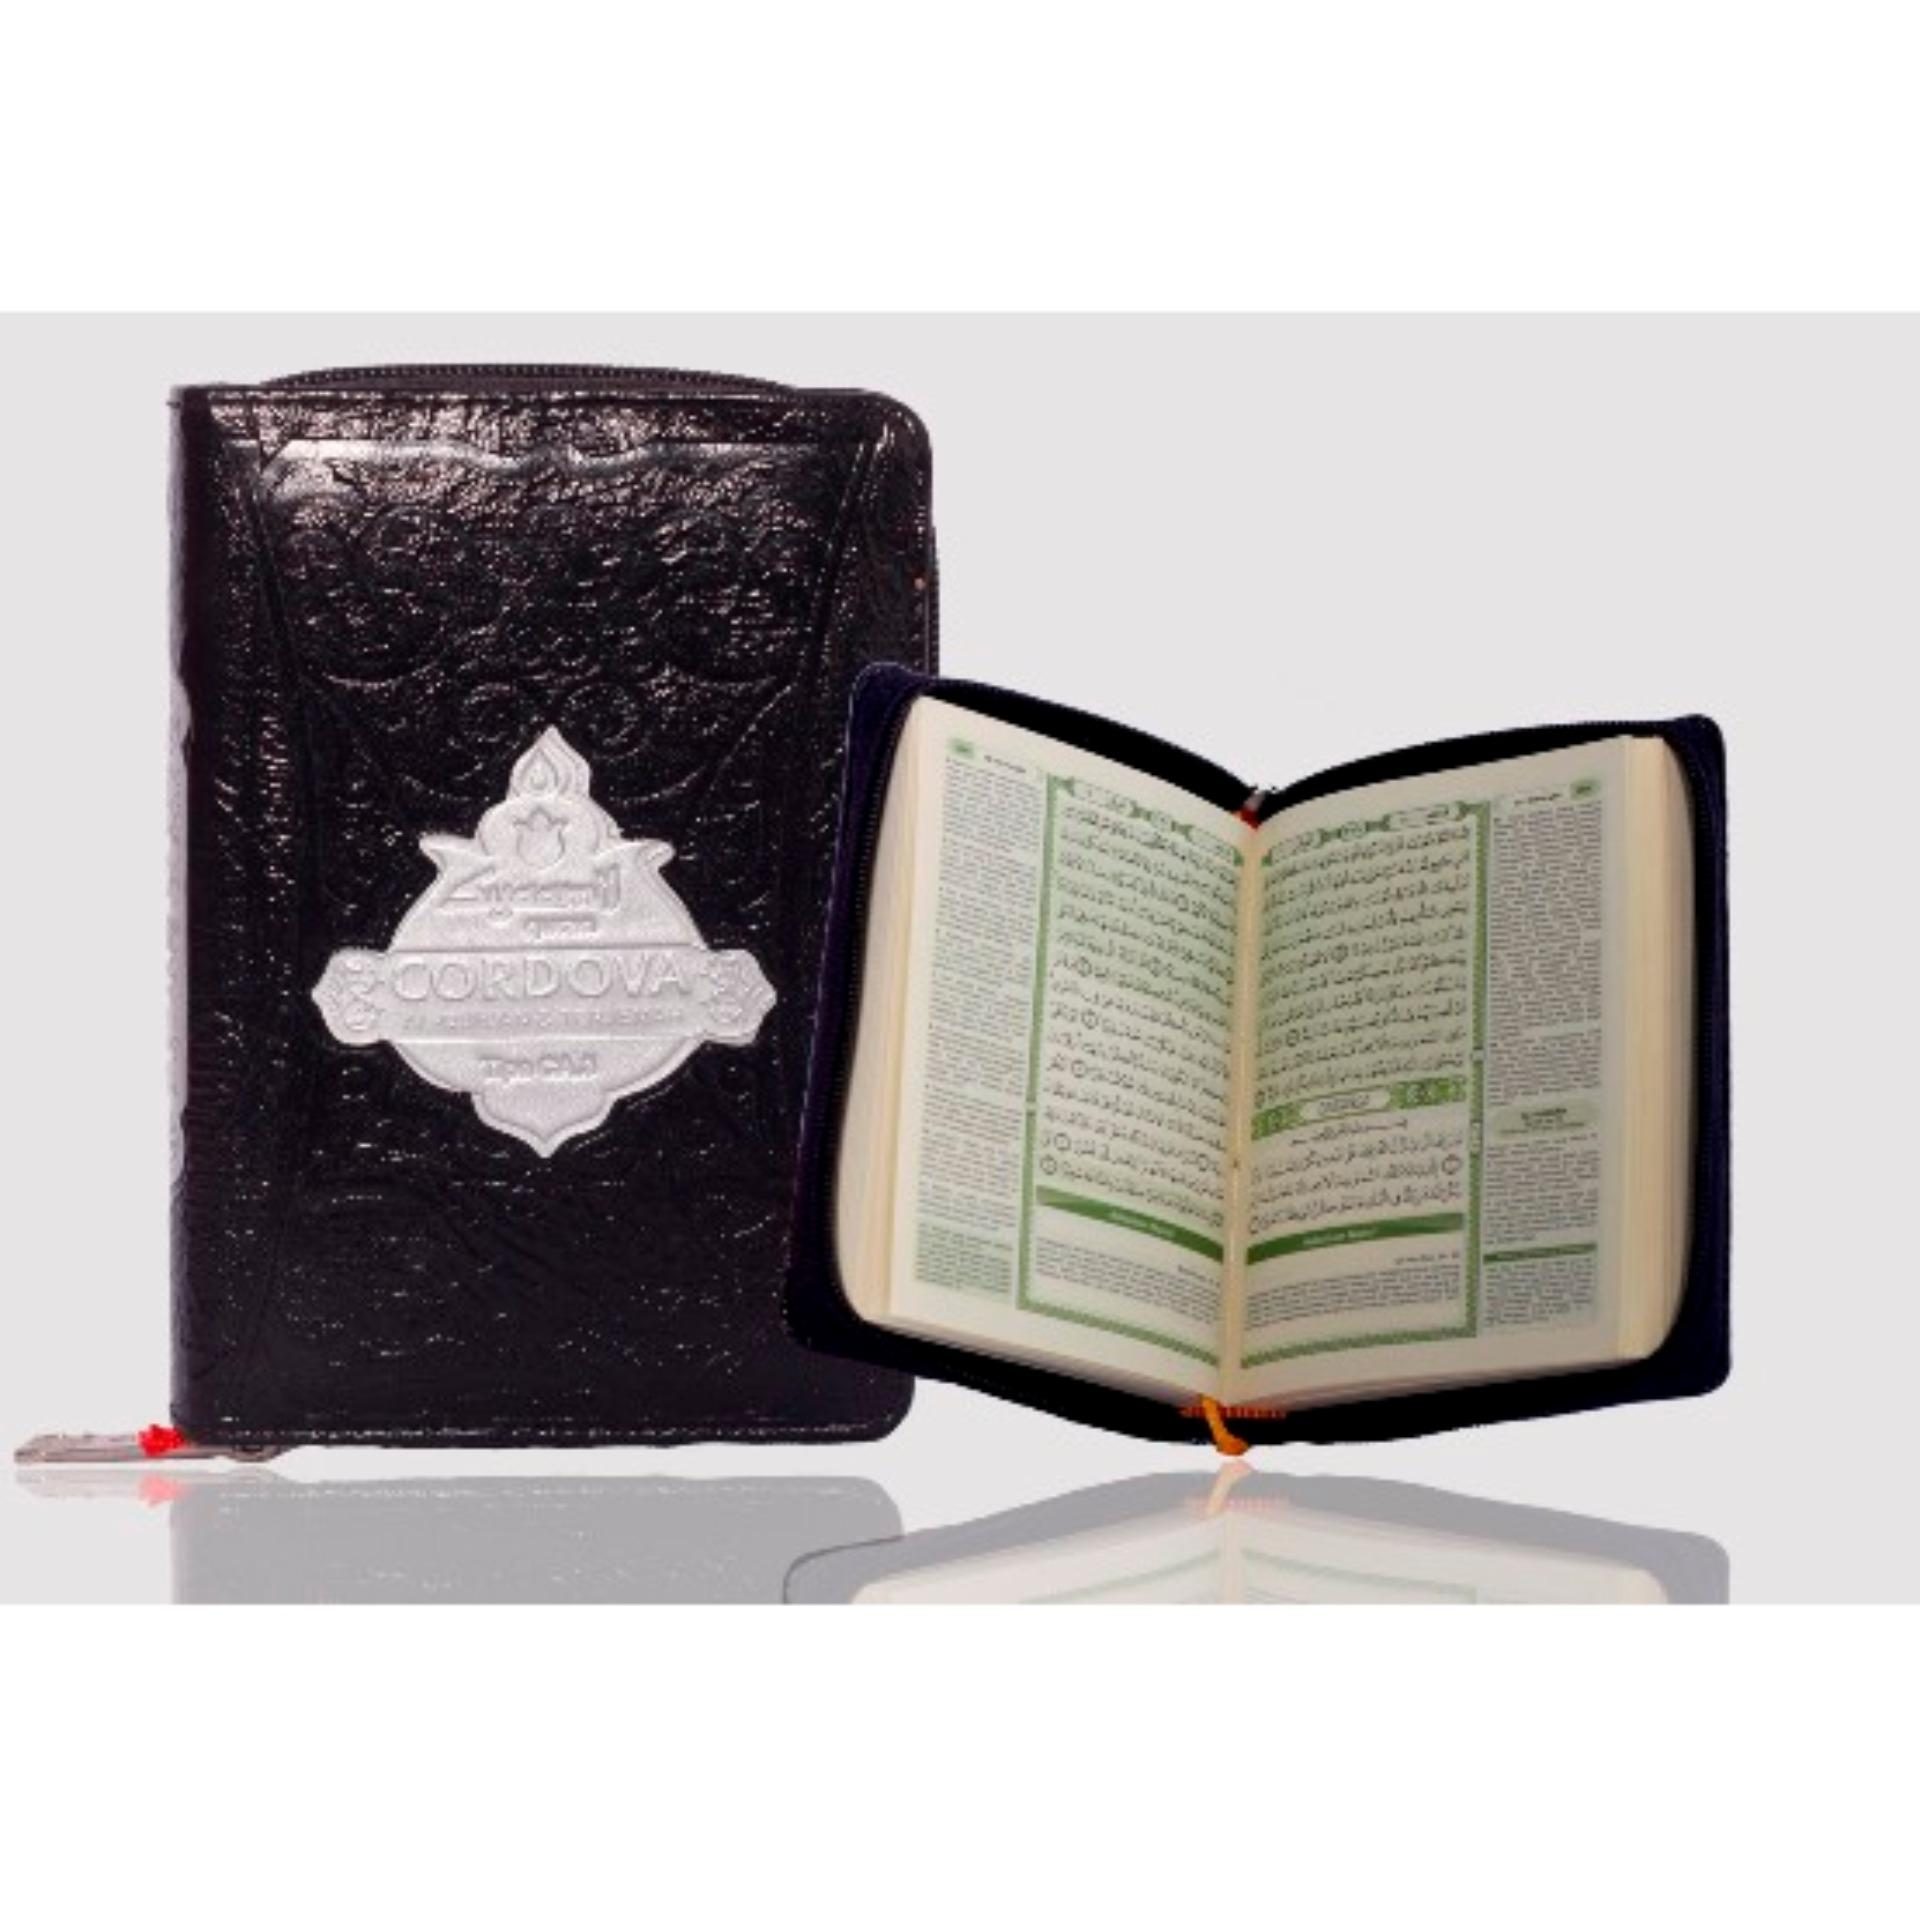 Spesifikasi Syaamil Al Quran Terjemah Syaamil Cordova Resleting A6 Baru